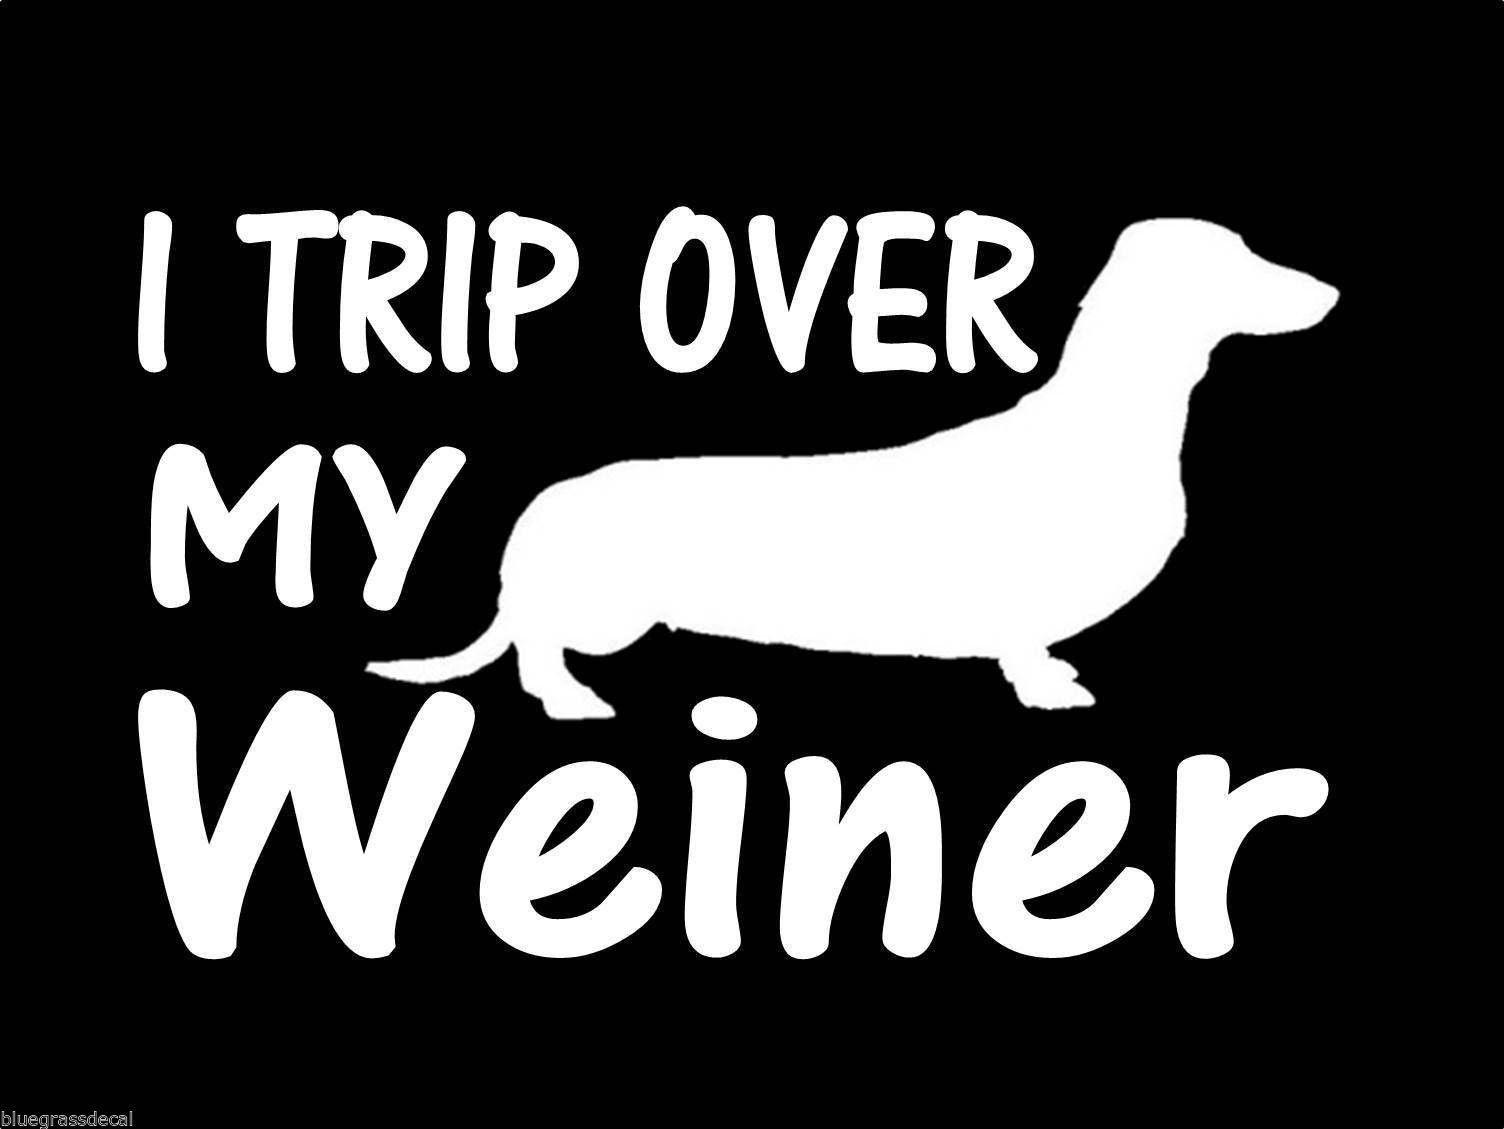 Amazon Com Trip Over My Weiner Dachshund Dog Vinyl Decal Sticker Other Products Vinyl Decal Stickers Dachshund Dog Dog Decals [ 1129 x 1504 Pixel ]